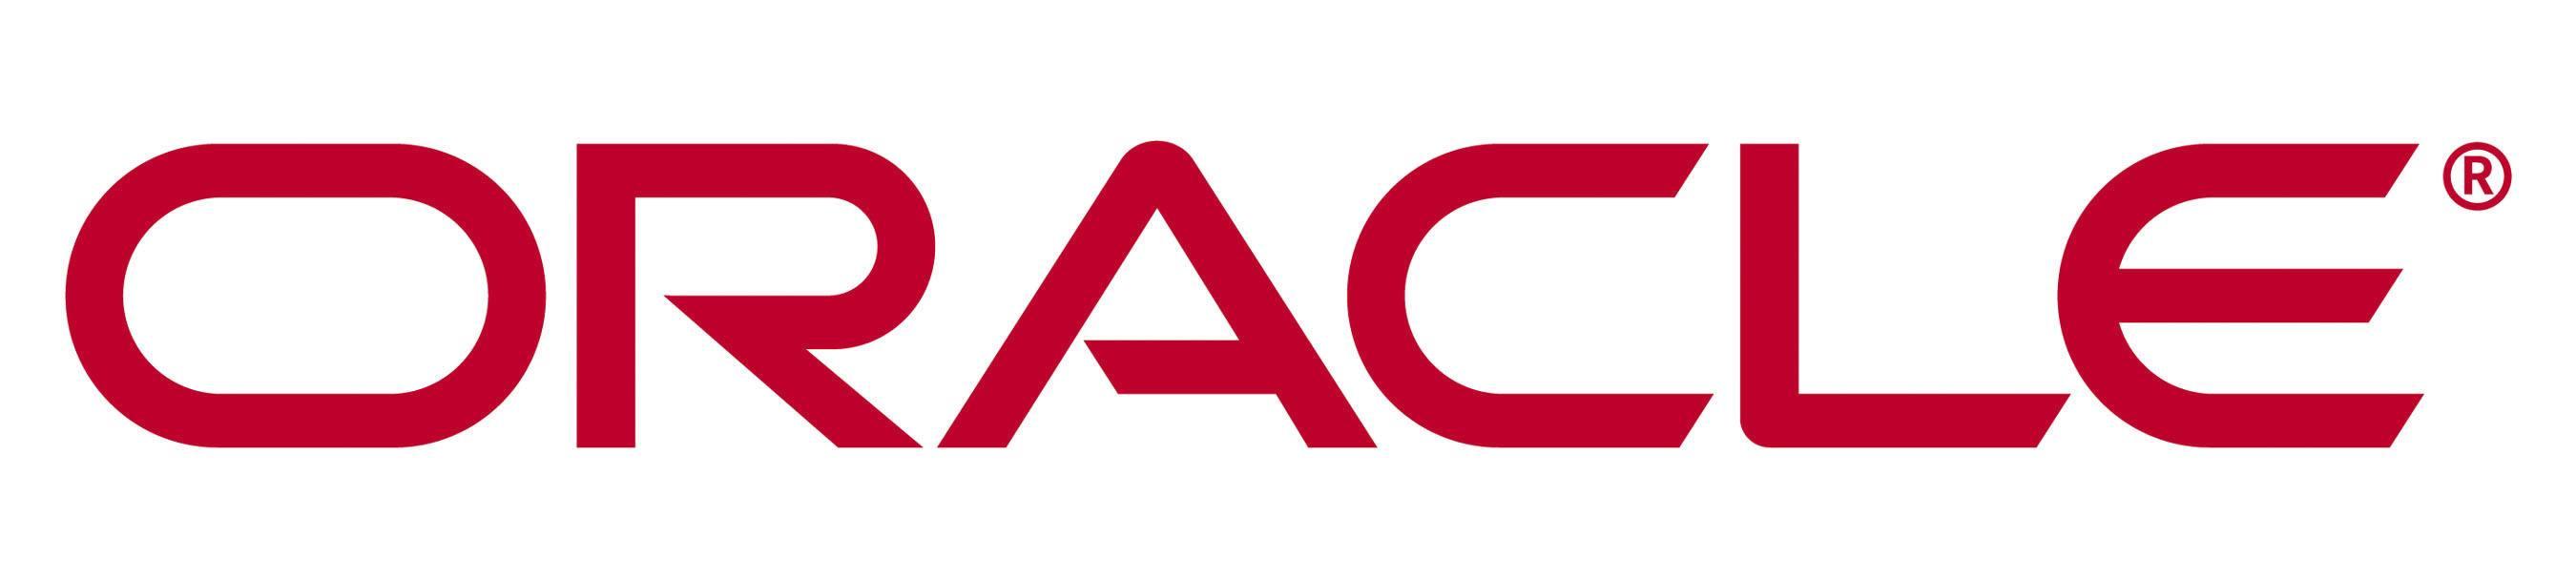 Oracle 11g基于CentOS7静默安装教程(无图形界面、远程安装)